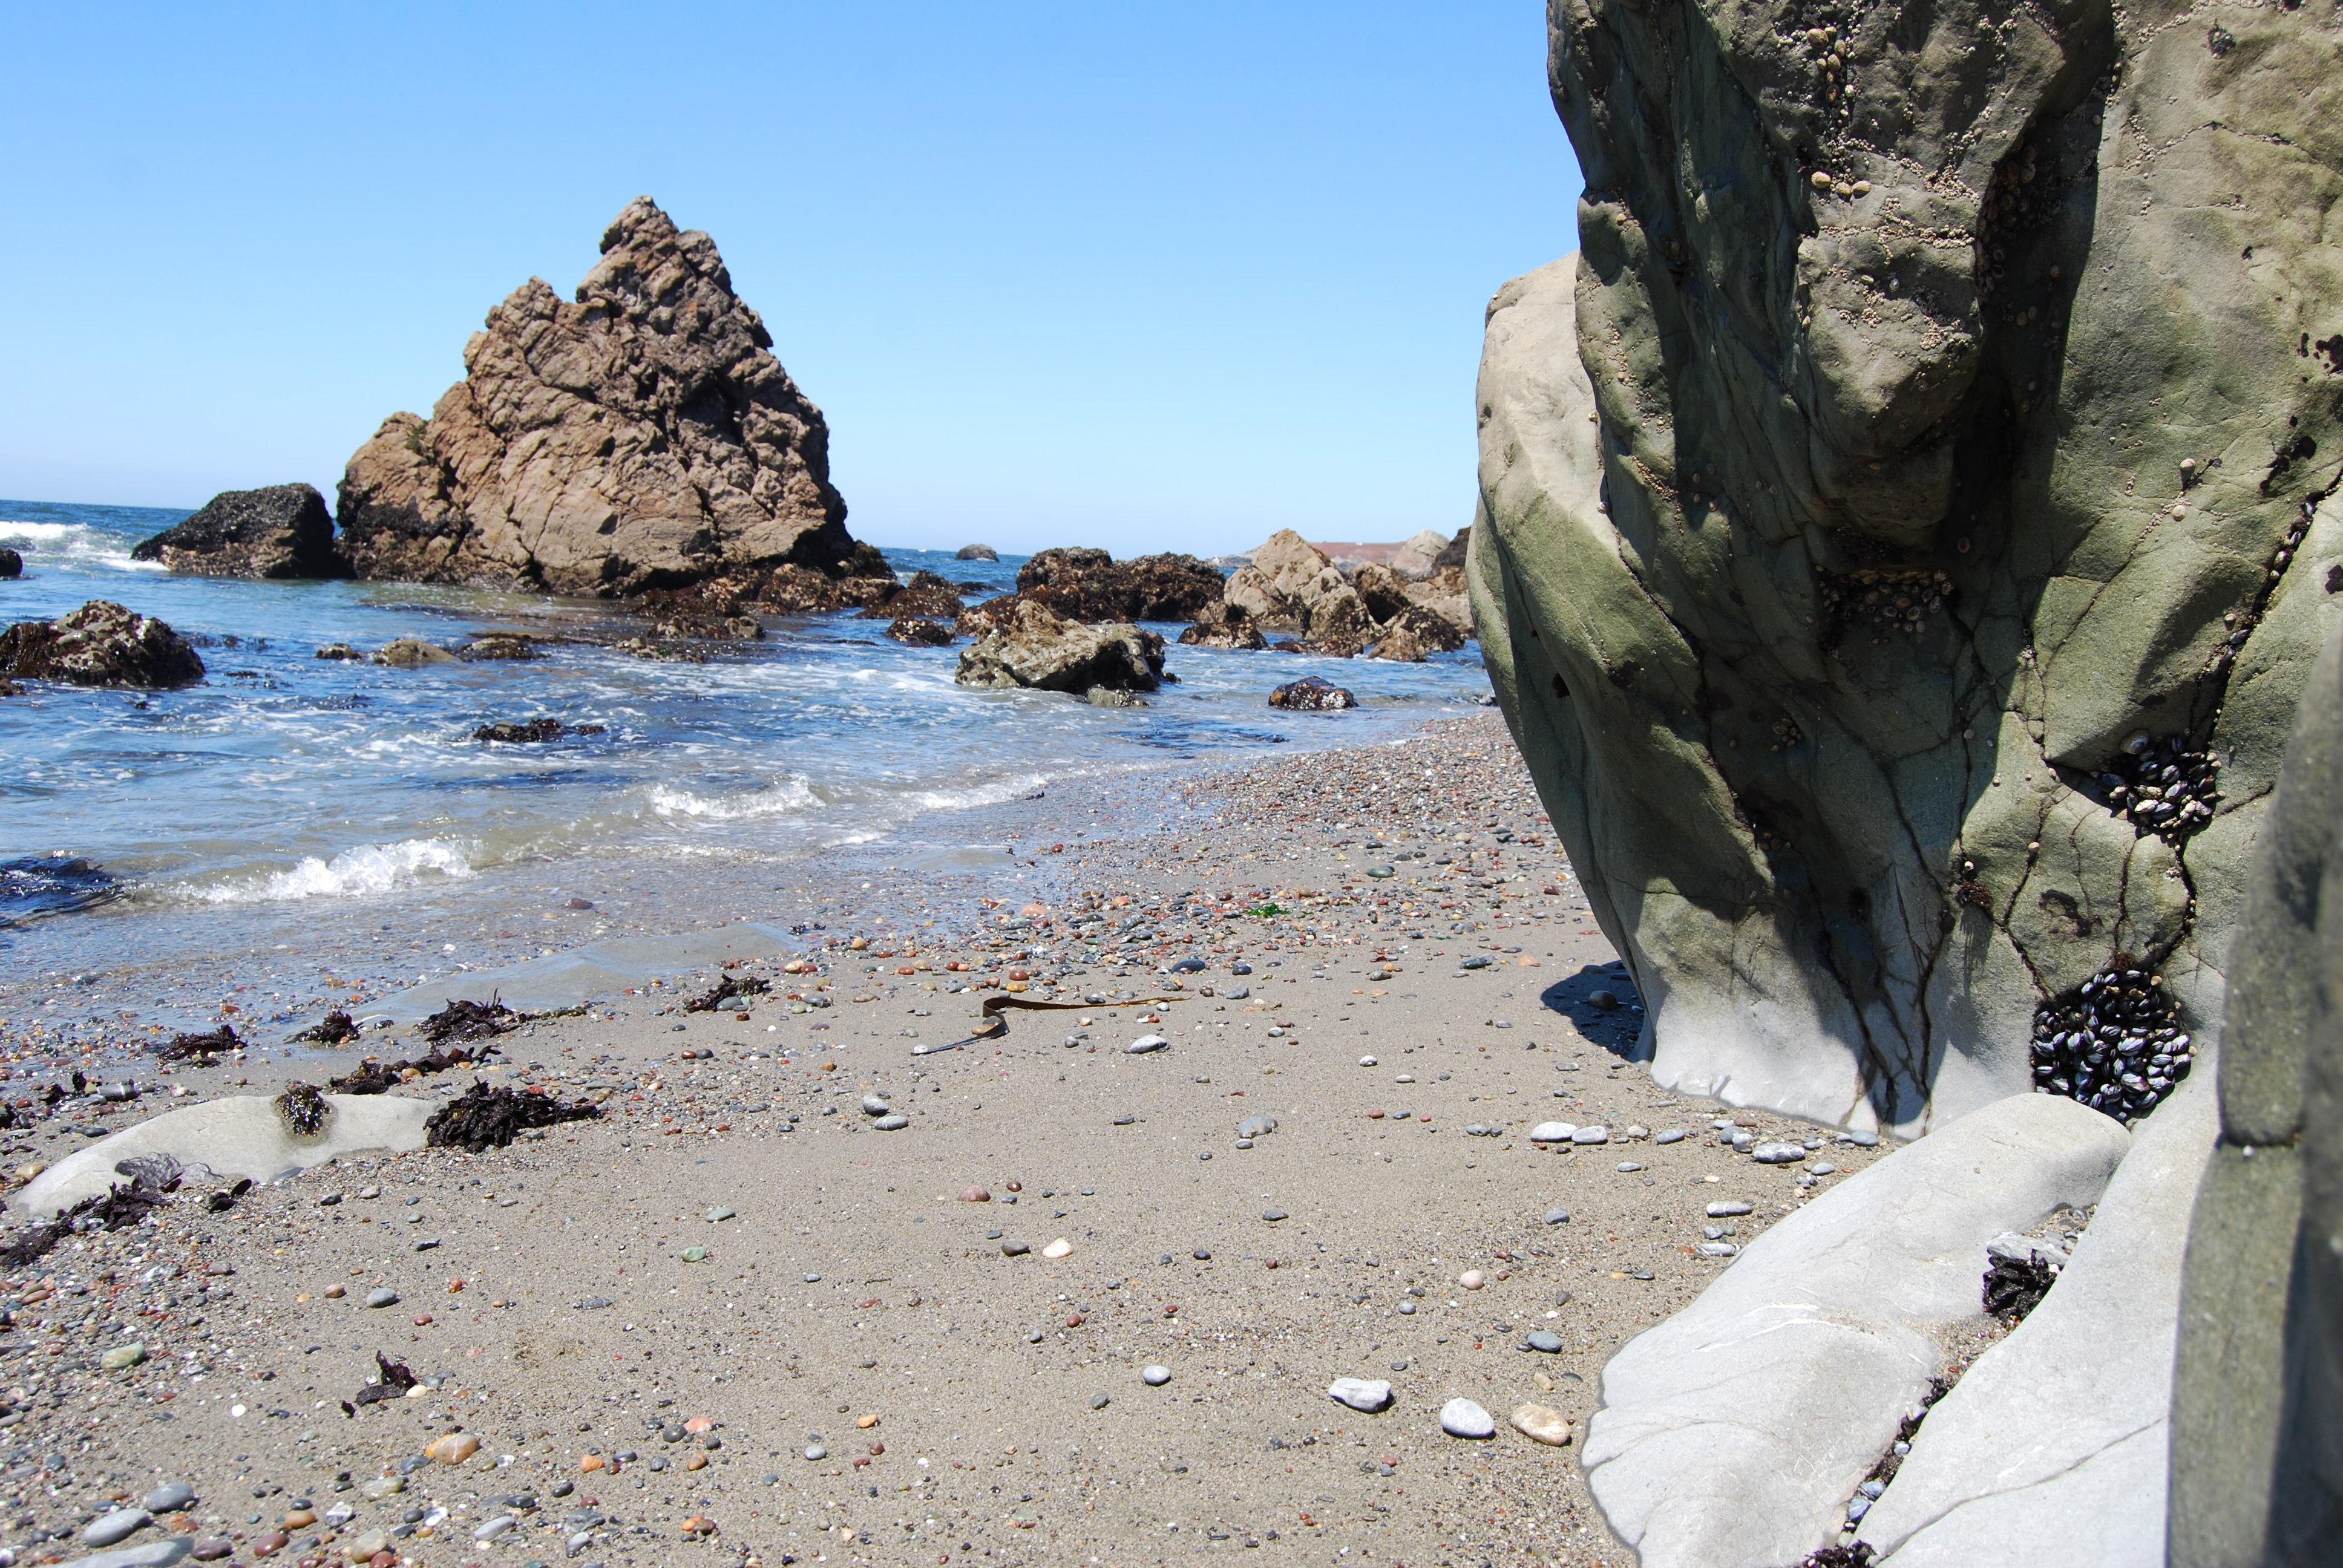 beach-at-bodega-bay-ca